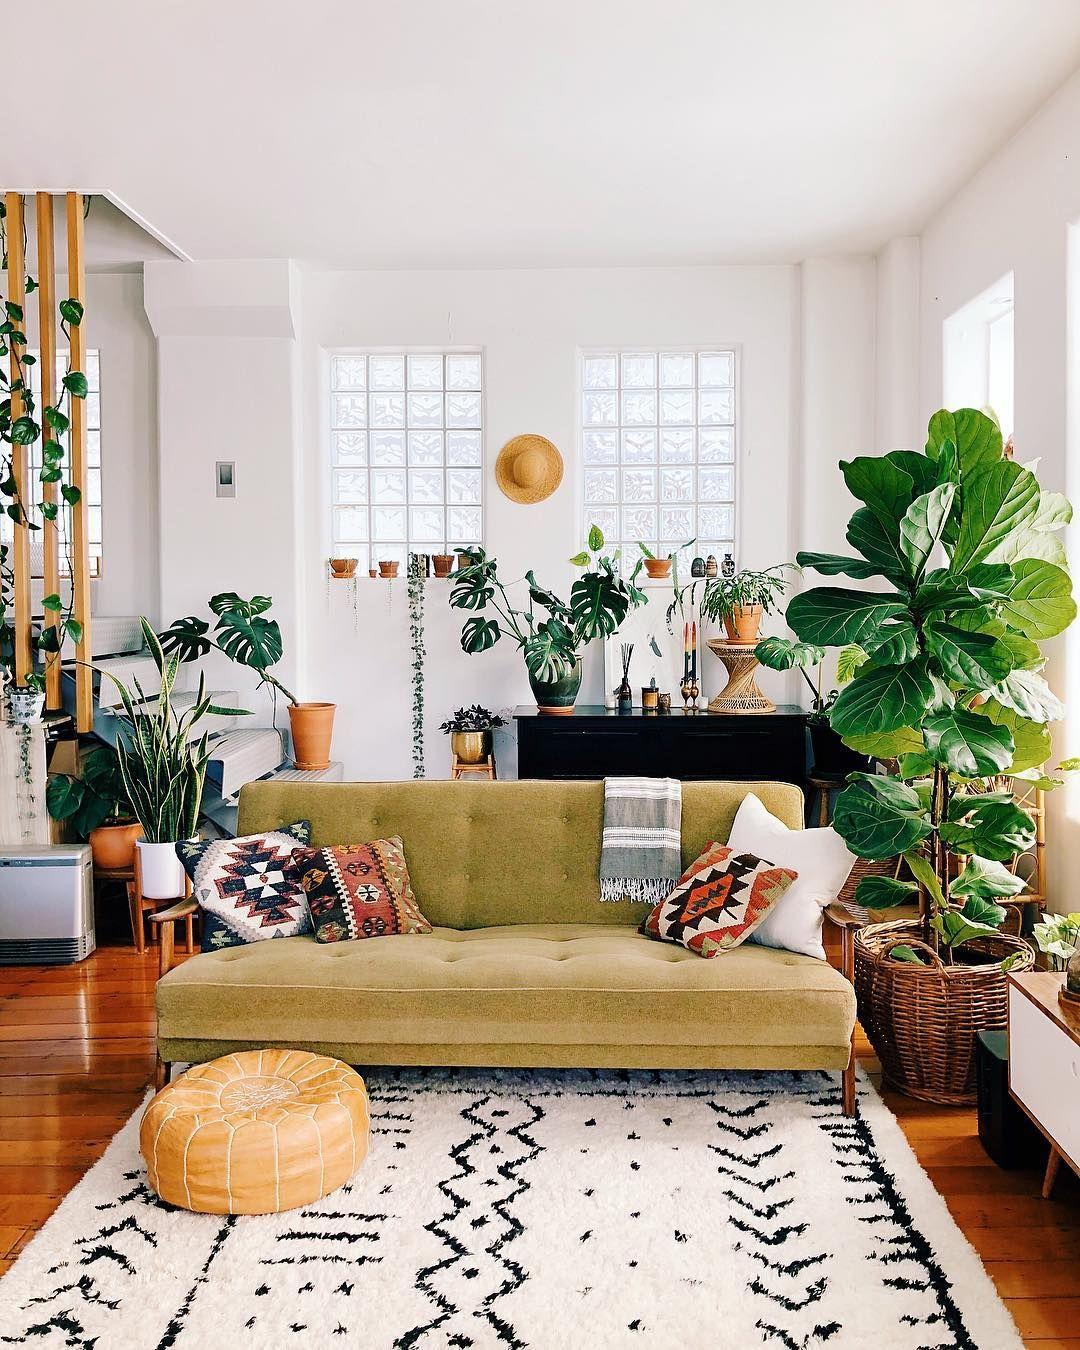 The Green Makes It Look So Fresh Room Inspiration Boho Living